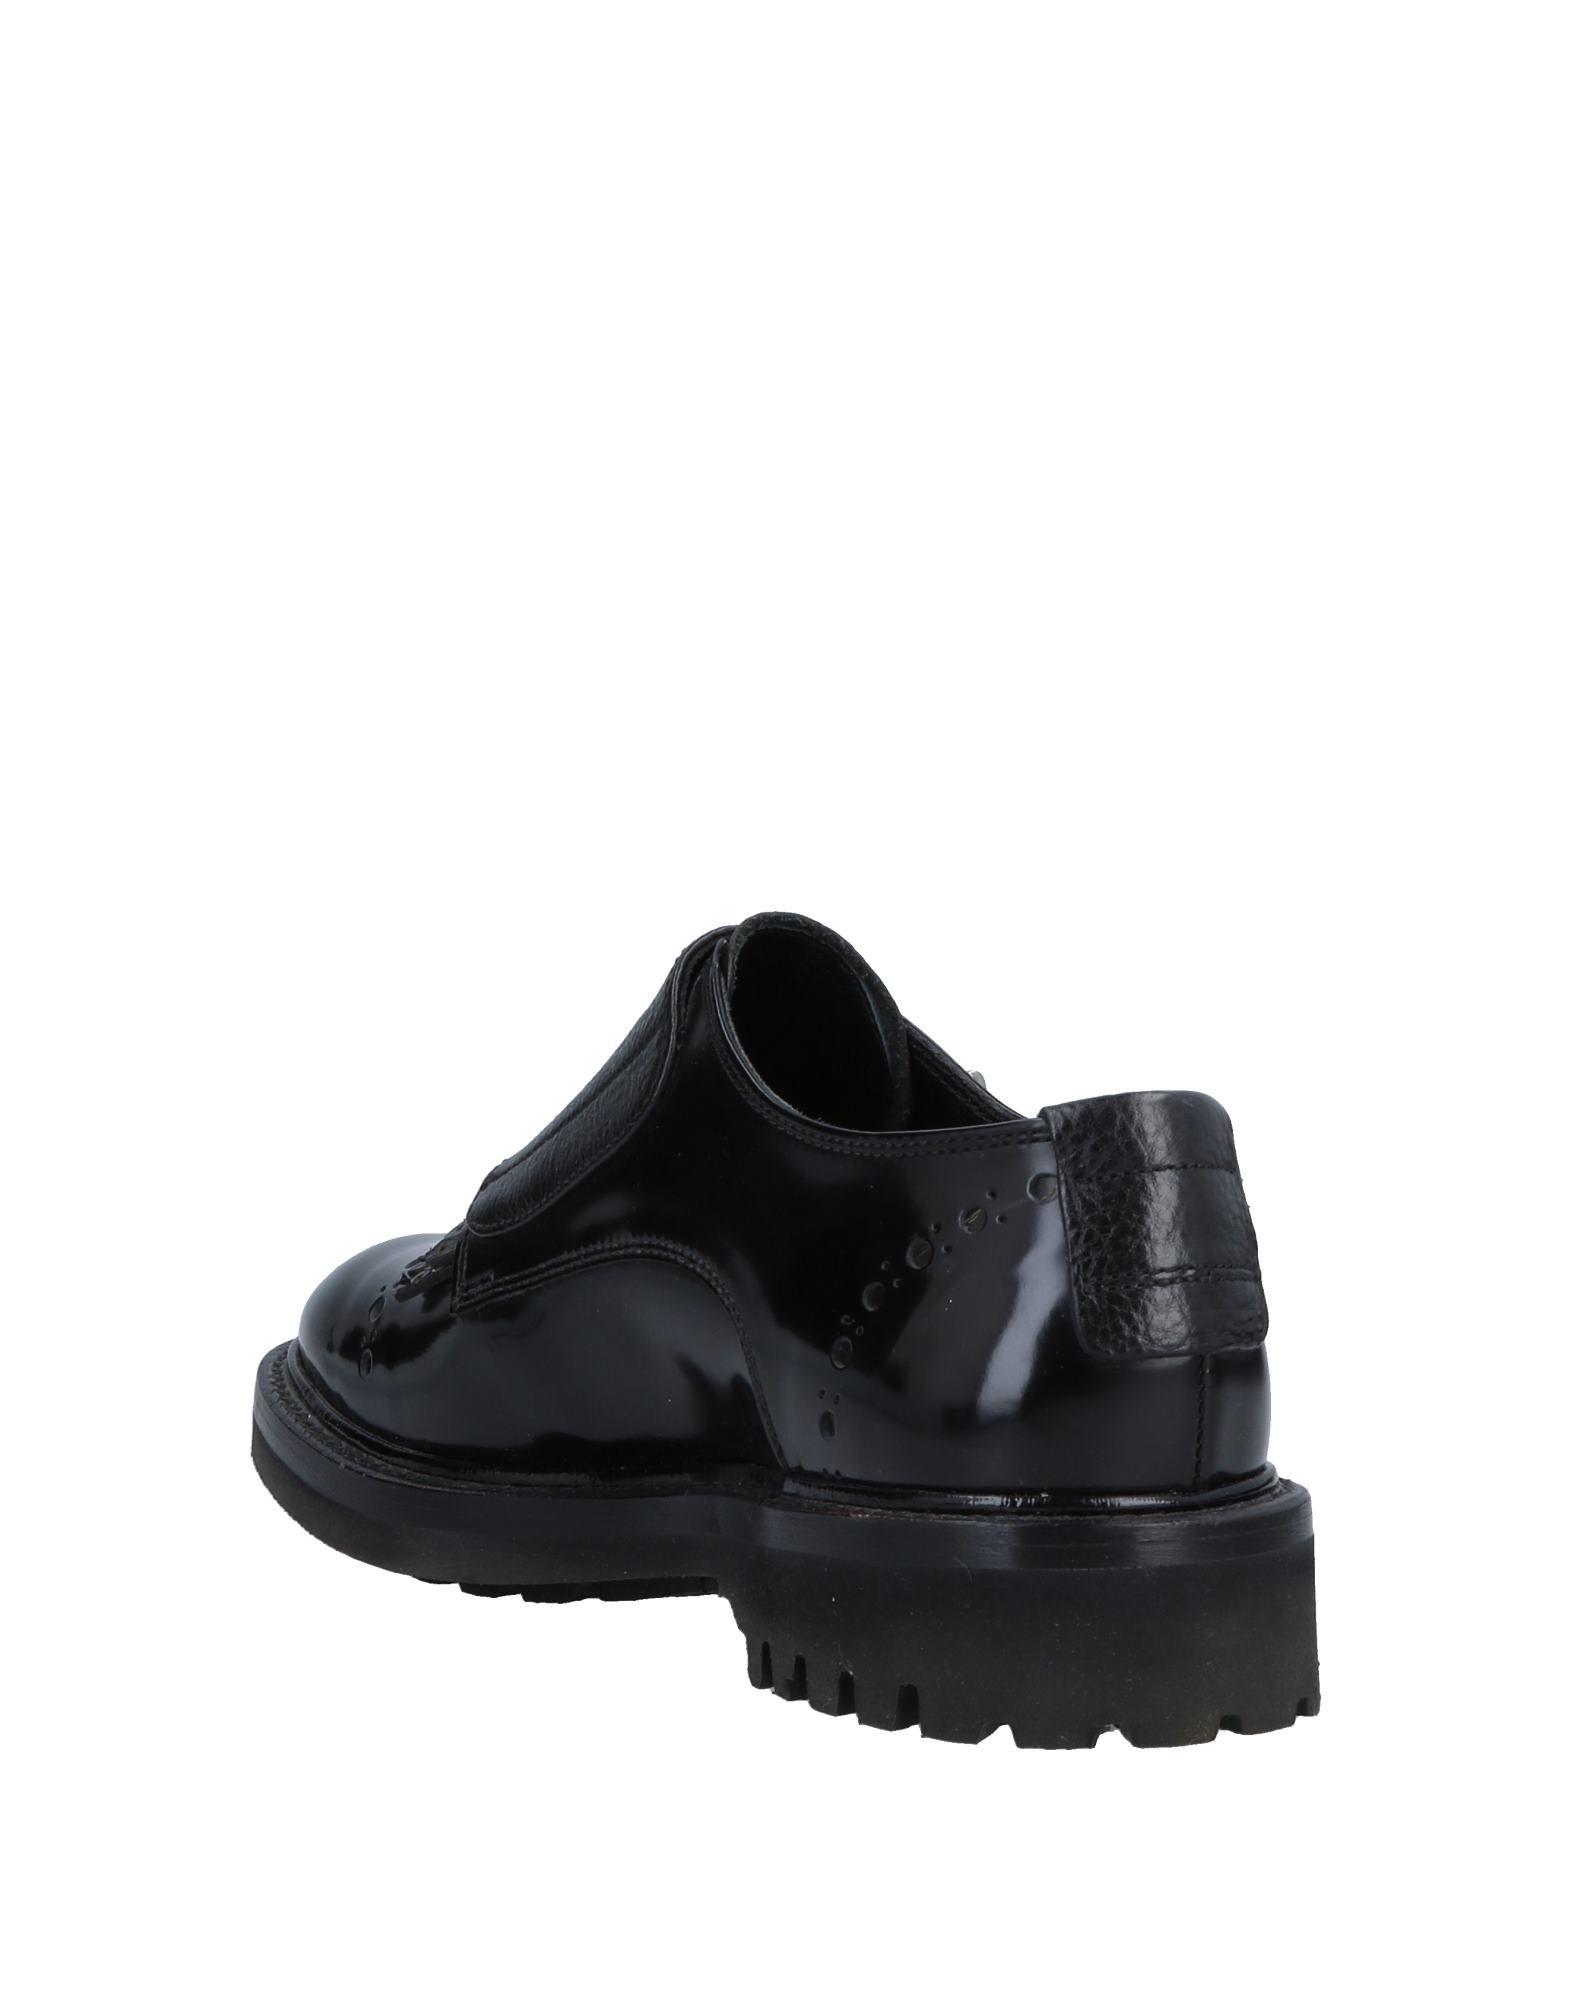 Stilvolle billige  Schuhe Barracuda Mokassins Damen  billige 11567226DG ad7288